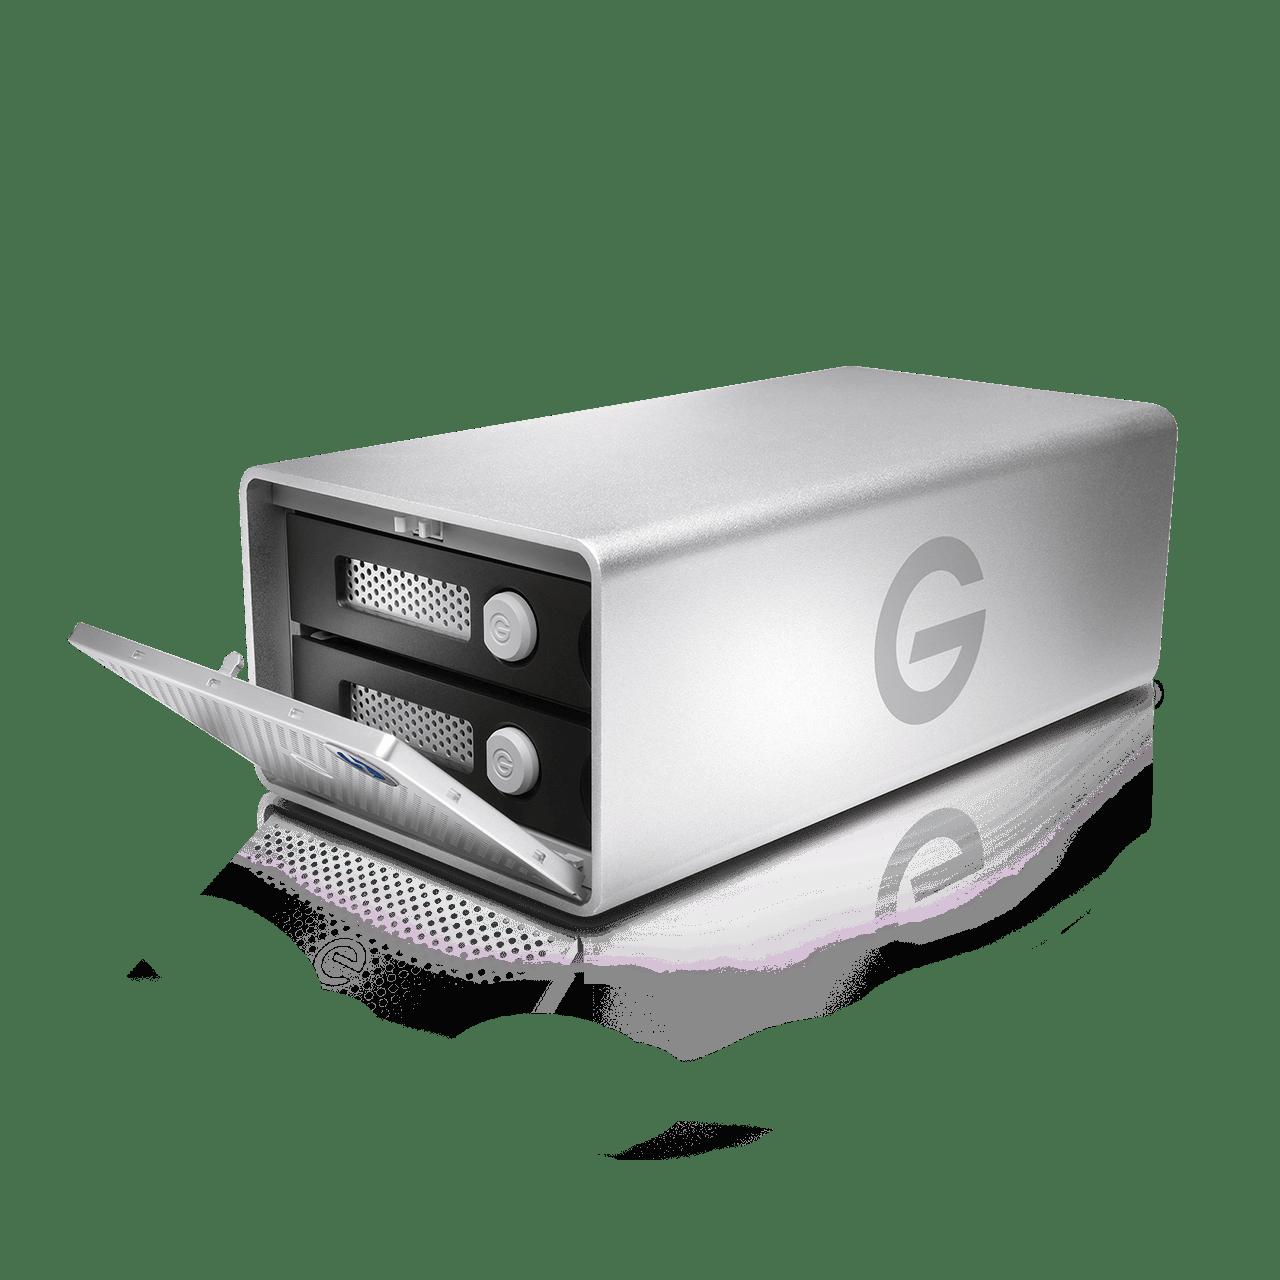 g-raid-thunderbolt-3-removable-hero1-open-png-thumb-1280-1280